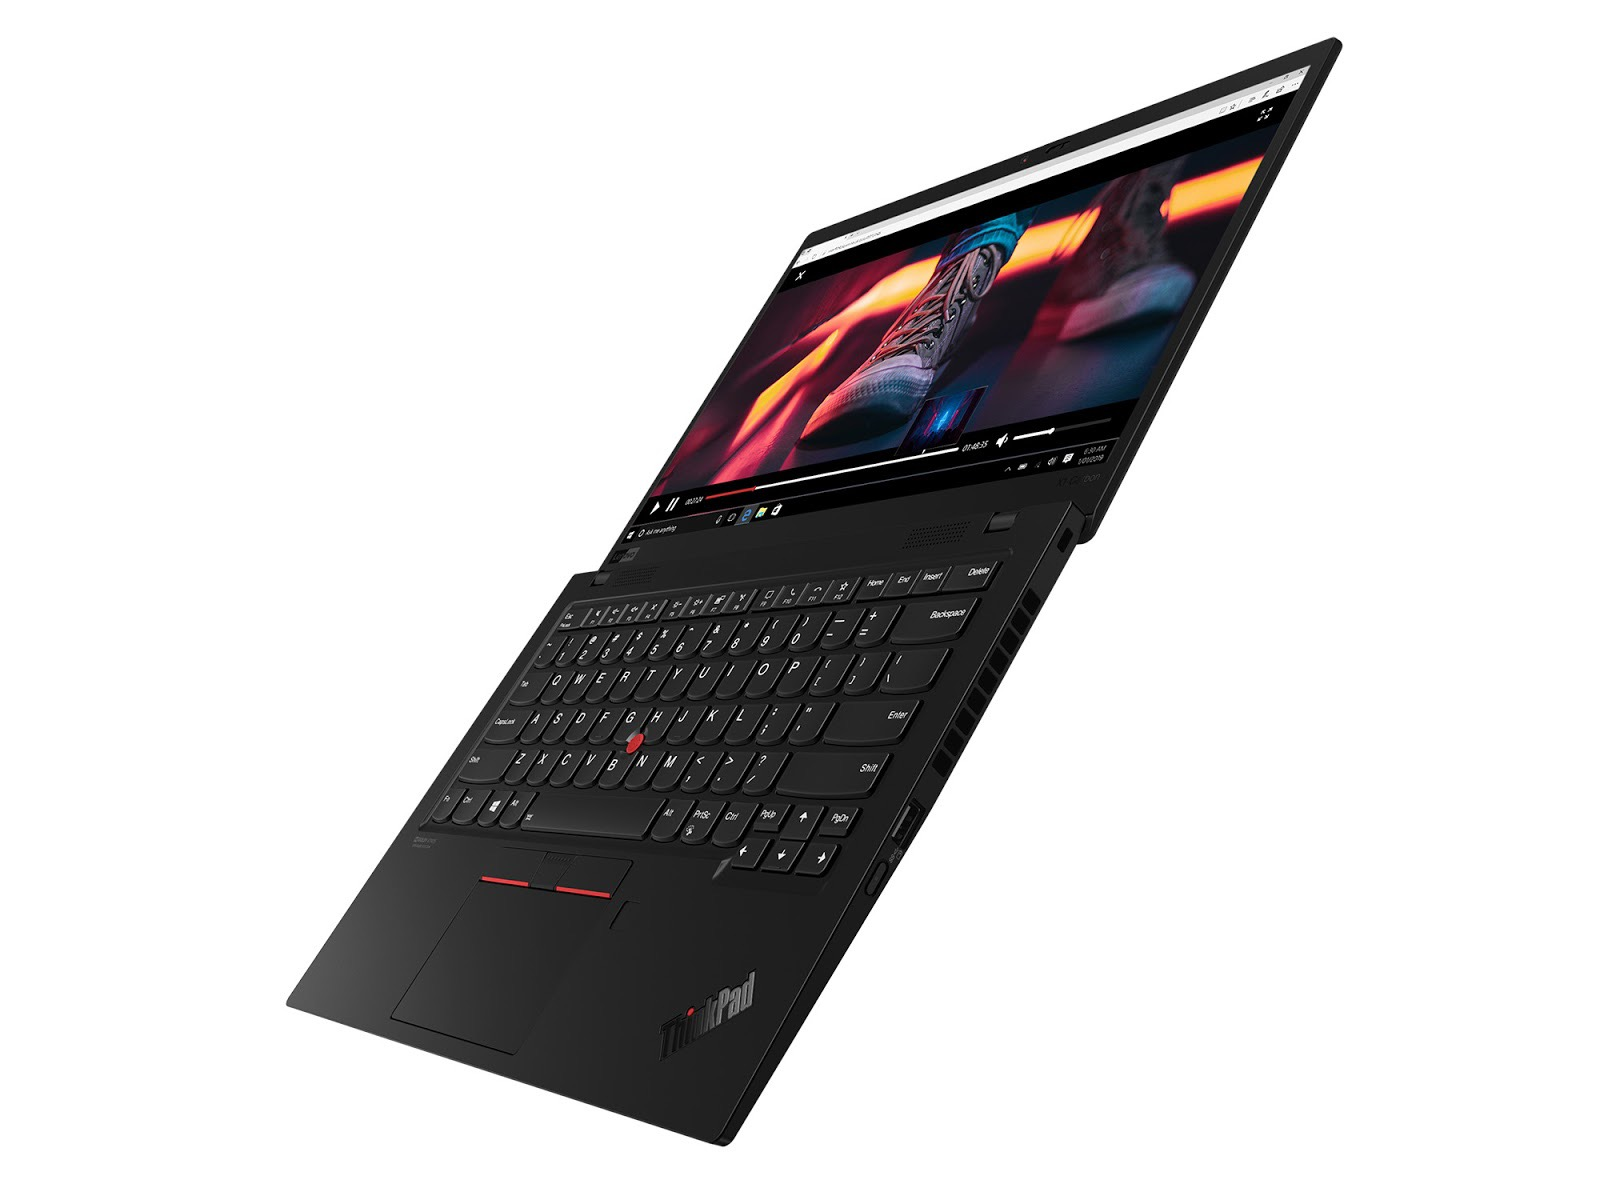 Фото 1. Ноутбук Lenovo ThinkPad X1 Carbon Gen 8 Black (20U90003RT)